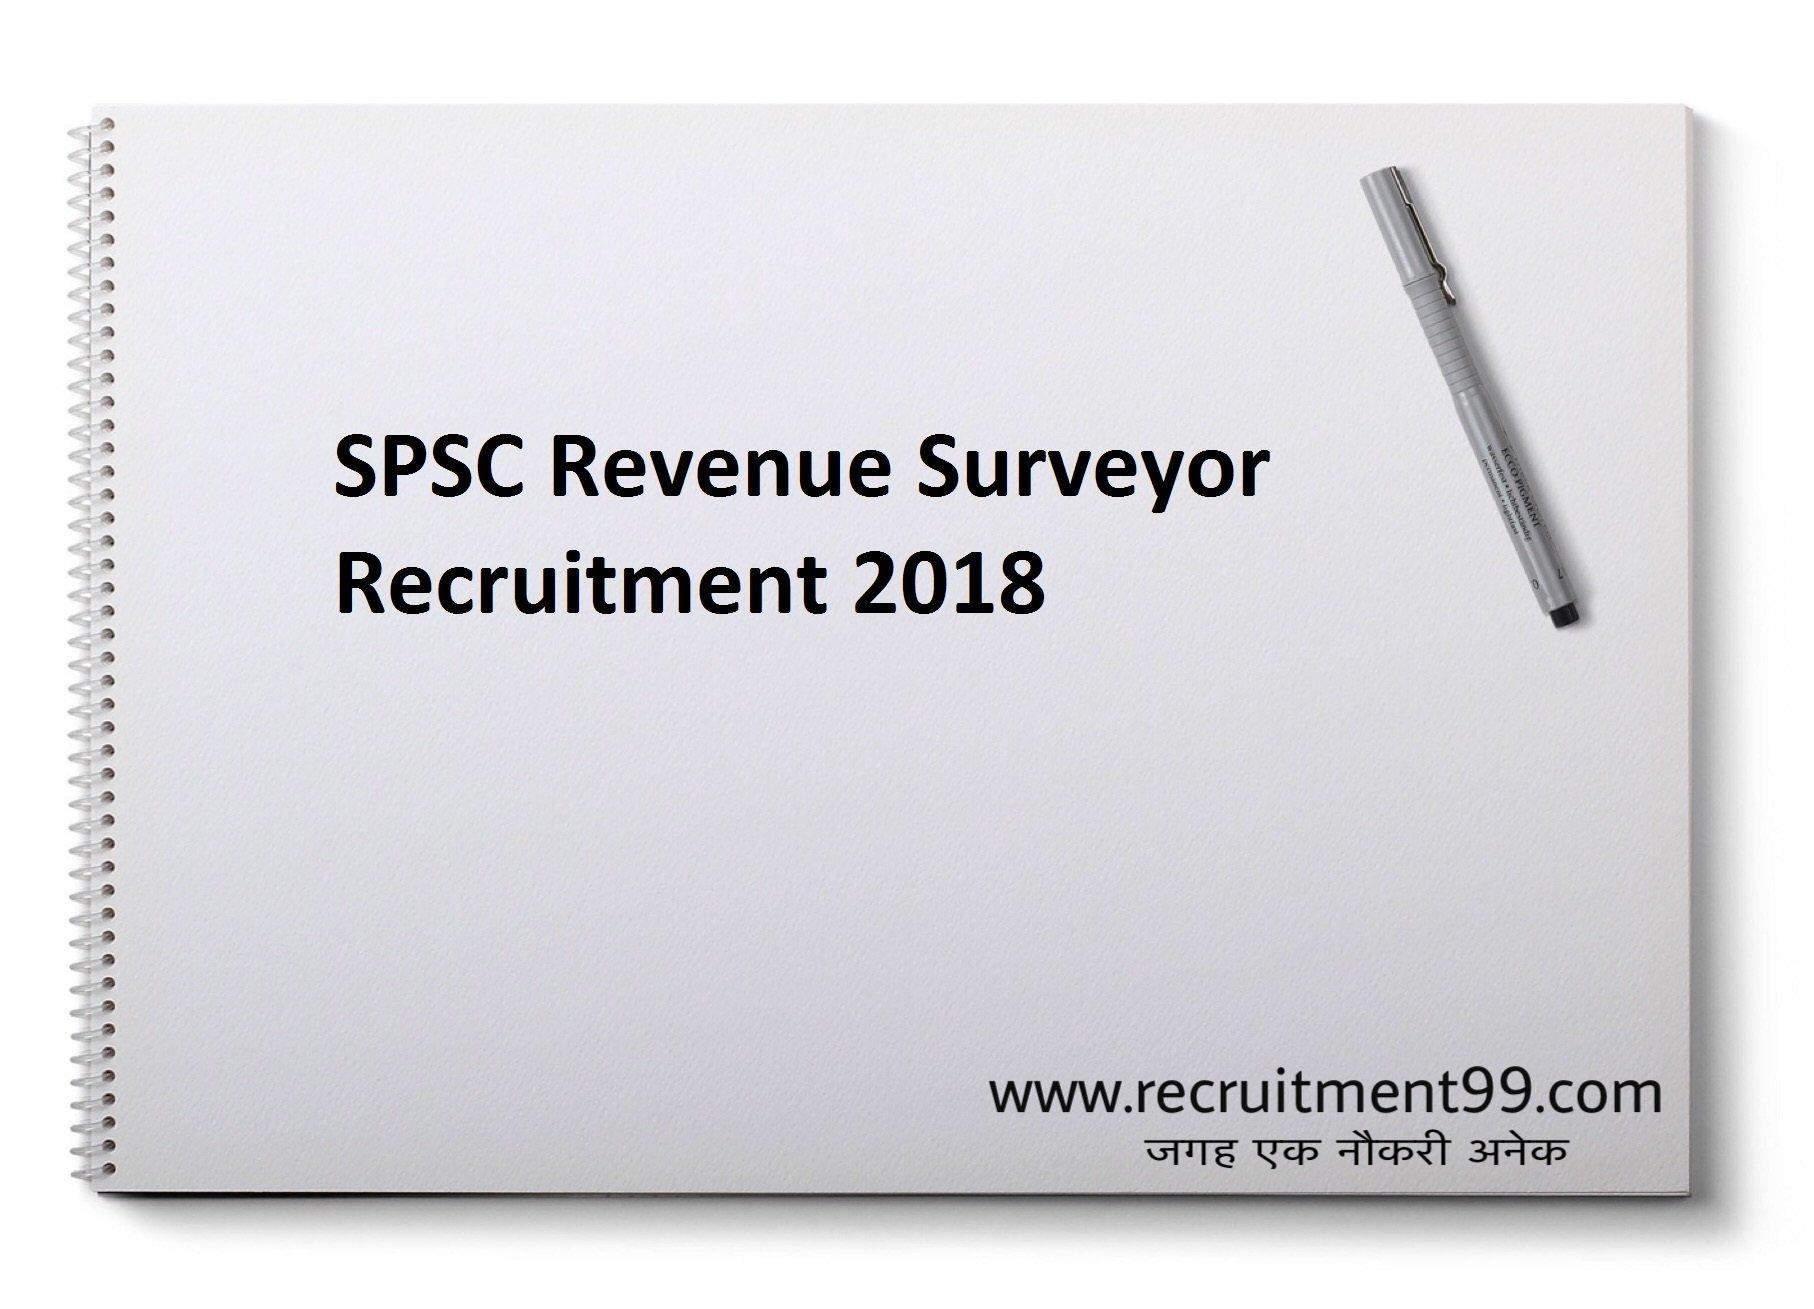 SPSC Revenue Surveyor Recruitment Admit Card Result 2018